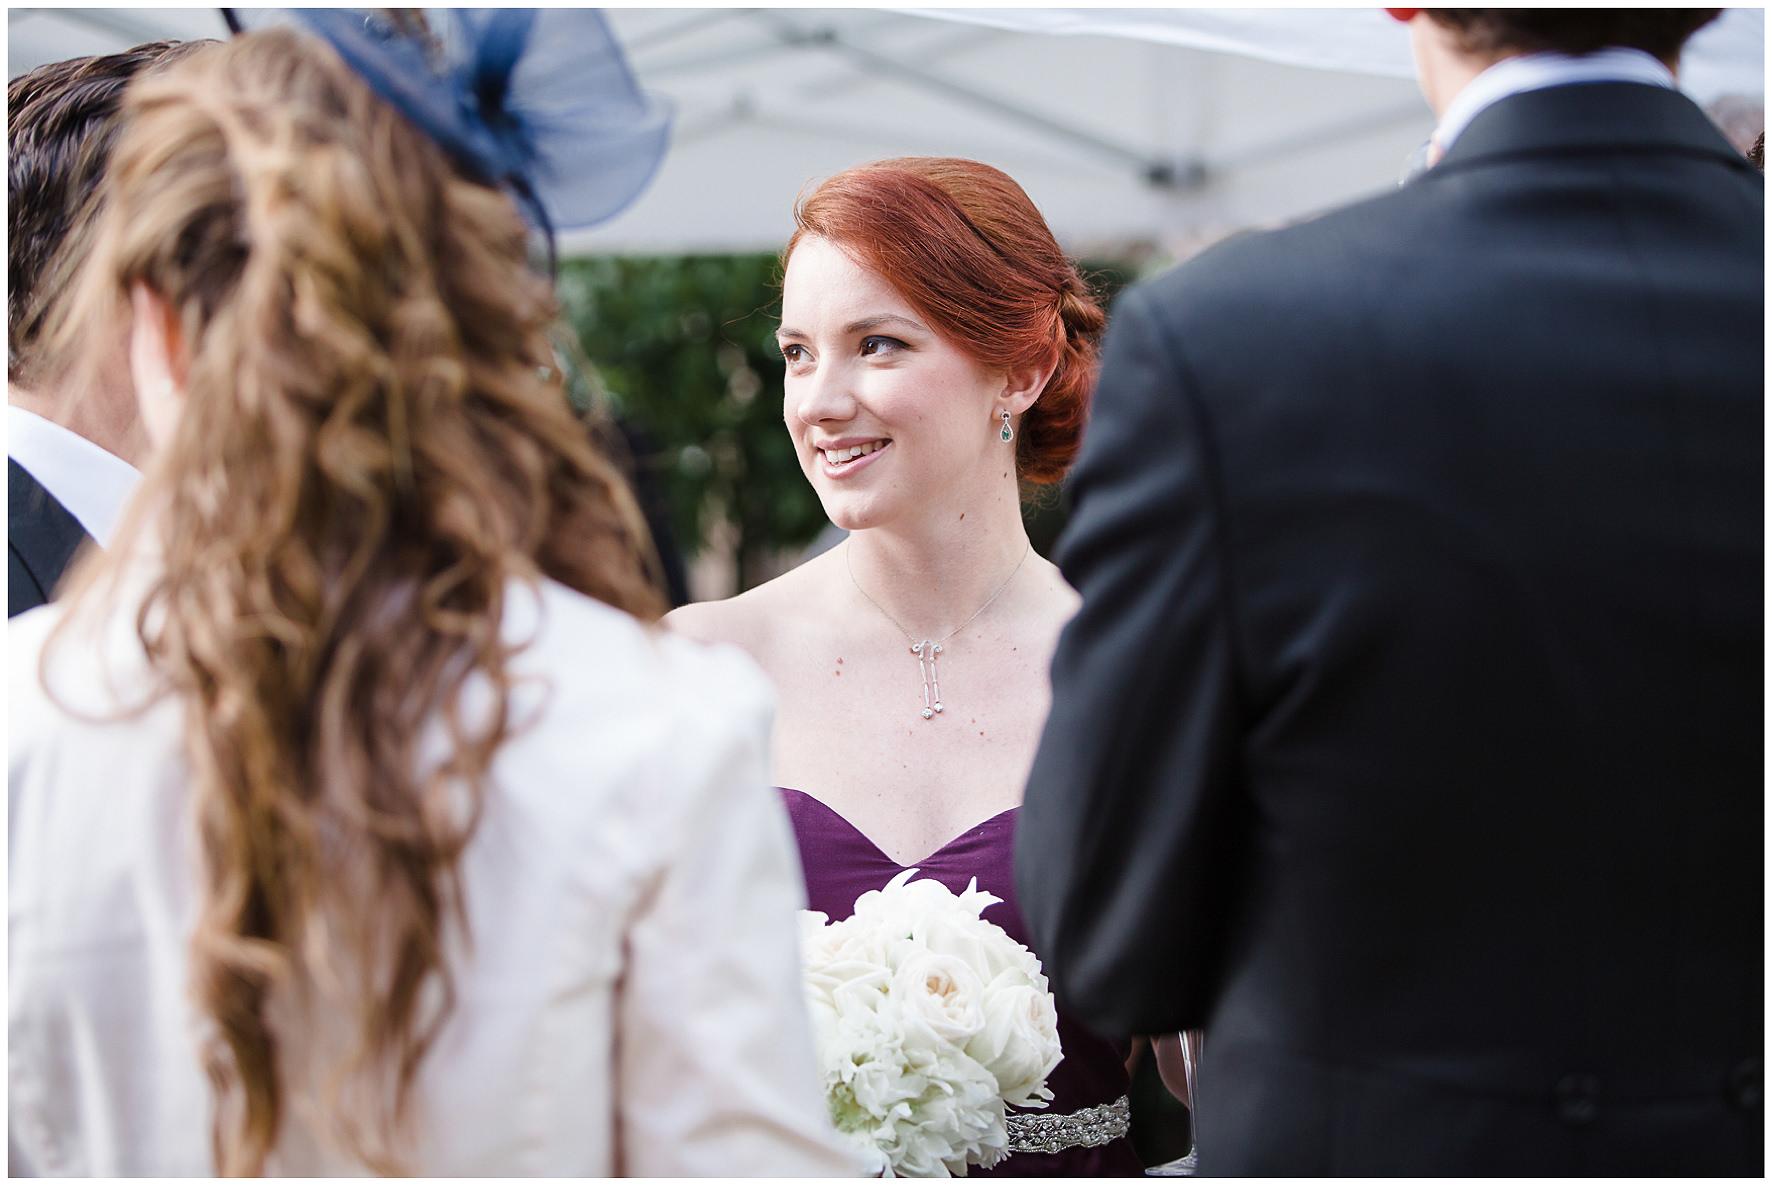 luxury wedding, berkshire, home wedding, drinks reception, Lucy Davenport Photography